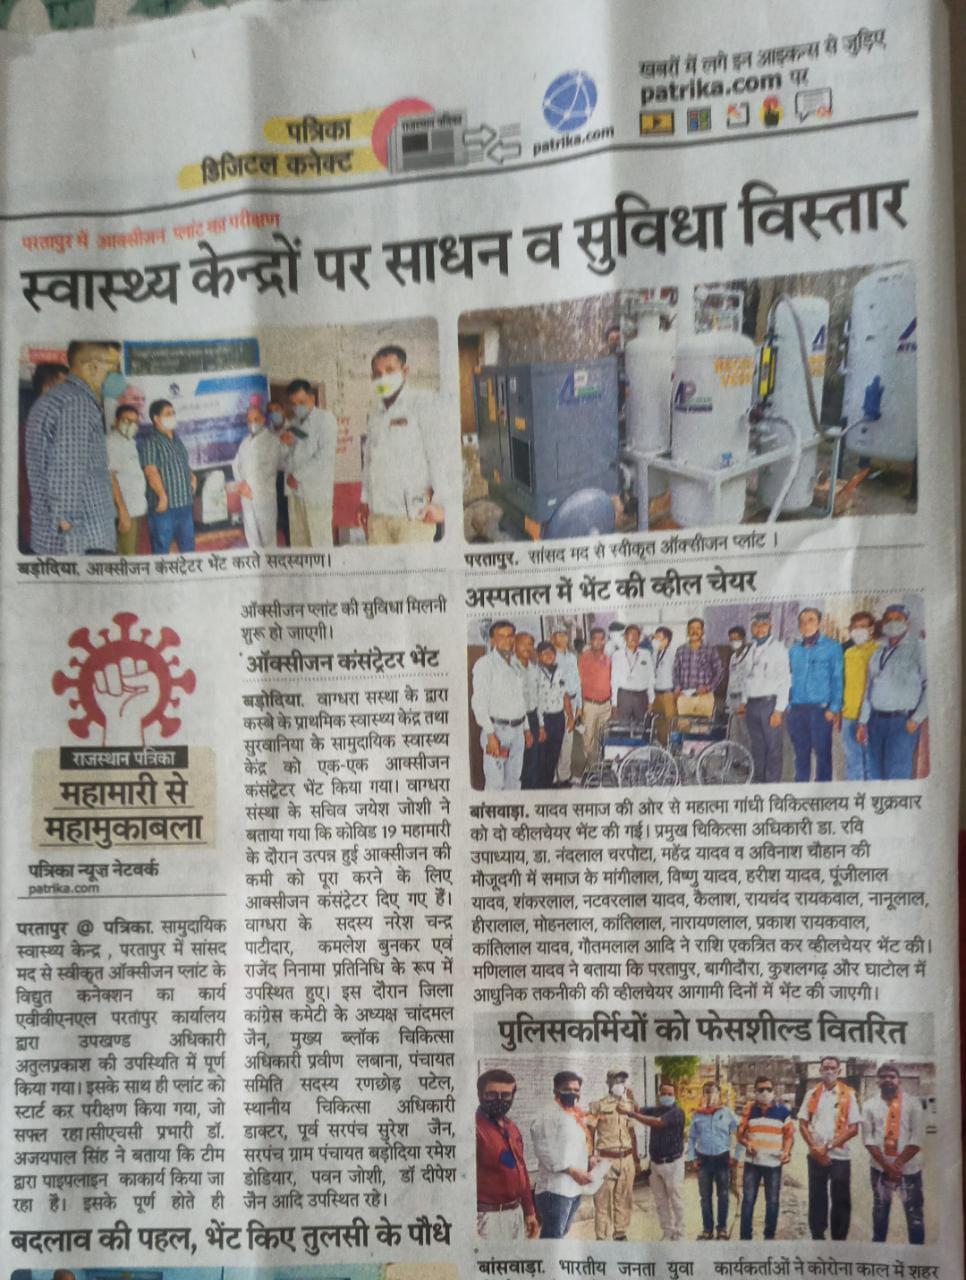 media-vaagdhara-donated-oxygen-concentrator-collector-banswara